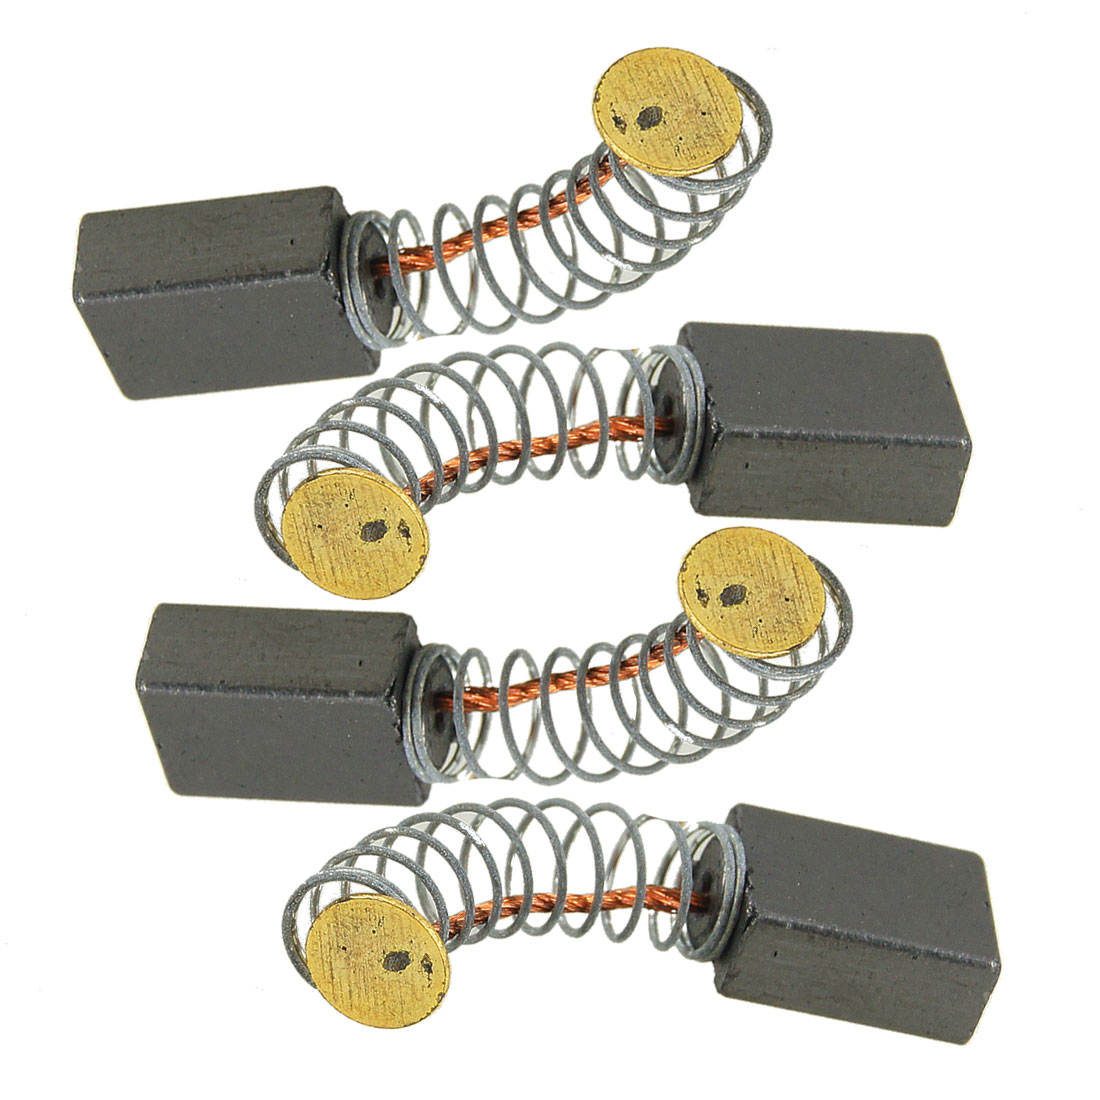 Dmiotech 4 Pcs Replacement Electric Motor Carbon Brushes 10mm 11mm 13mm 6mm 7.5mm 7mm 8mm 9mm For Motors